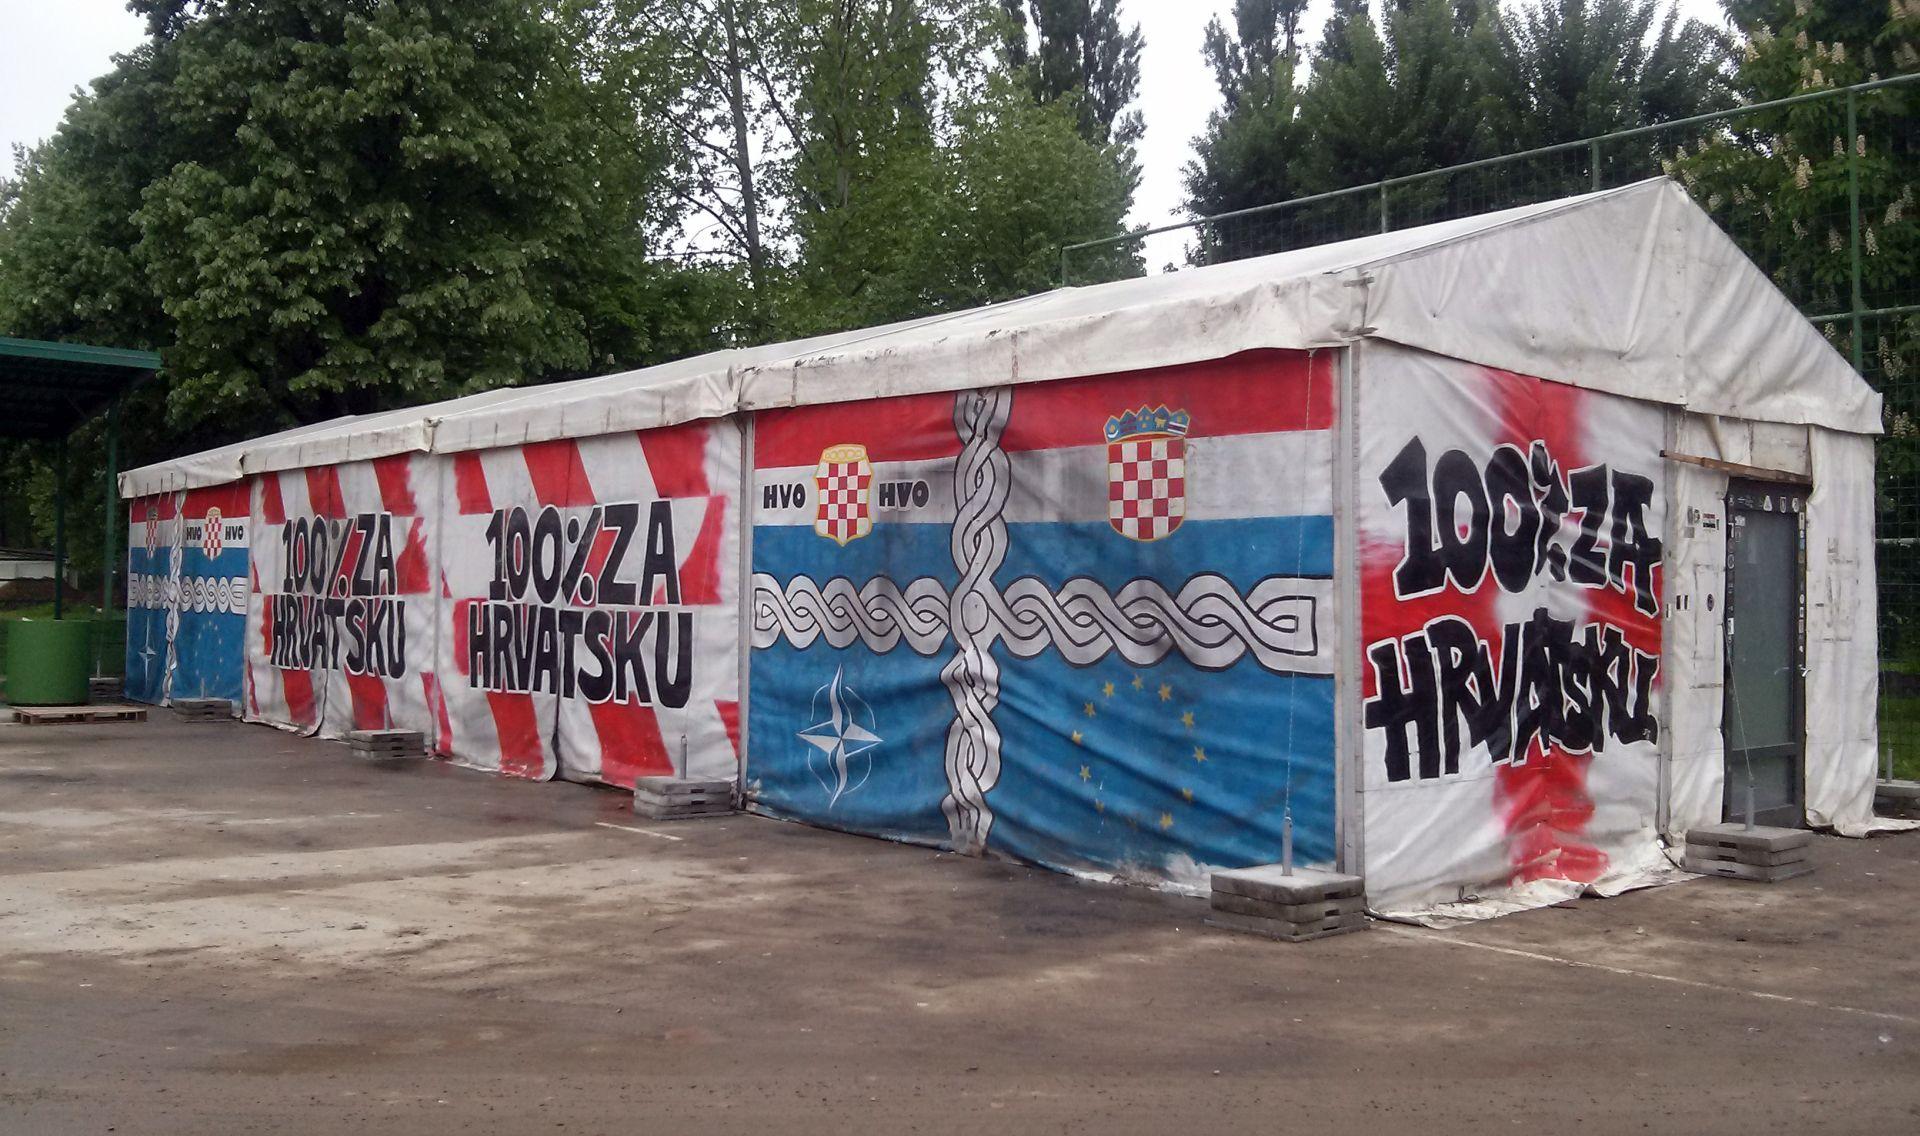 Unatoč protivljenju vukovarskih branitelja: Šator iz Savske donesen u Vukovar